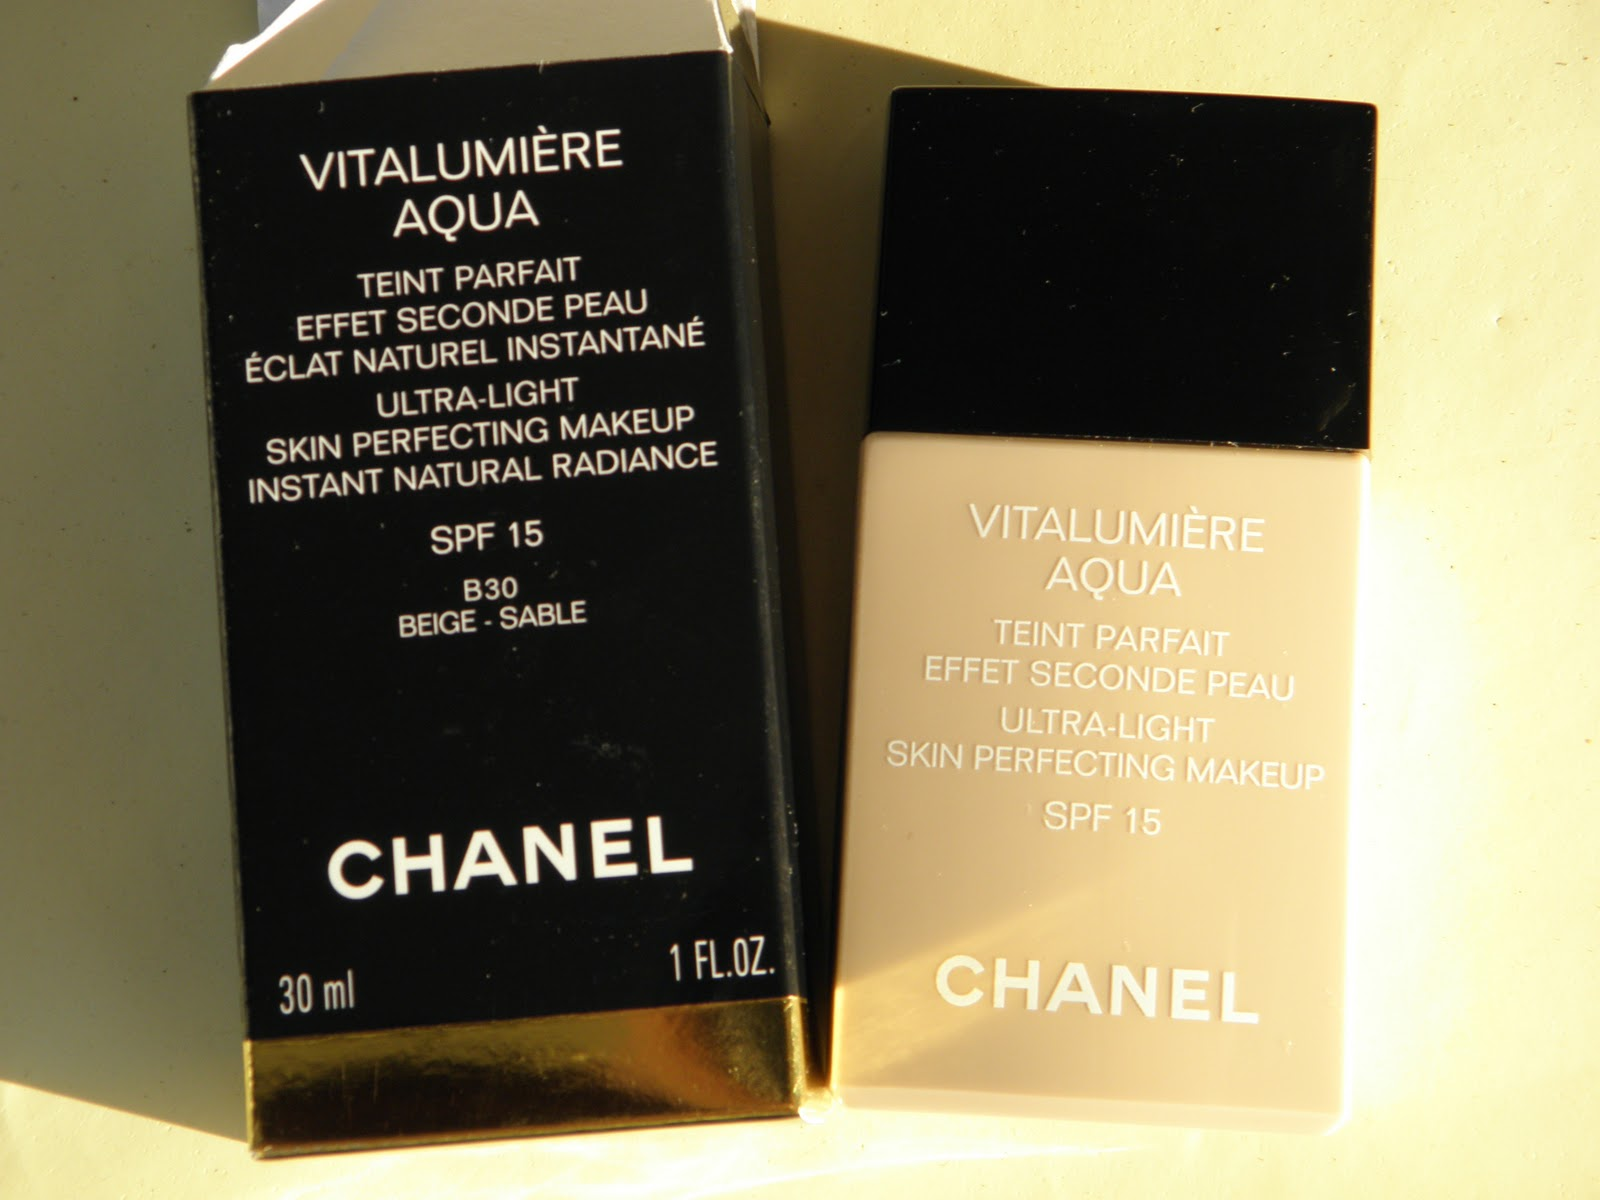 Glam Shine Beautyblog Chanel Vitalumiere Aqua Vitalumire Ultra Light Skin Perfecting Makeup Spf 15